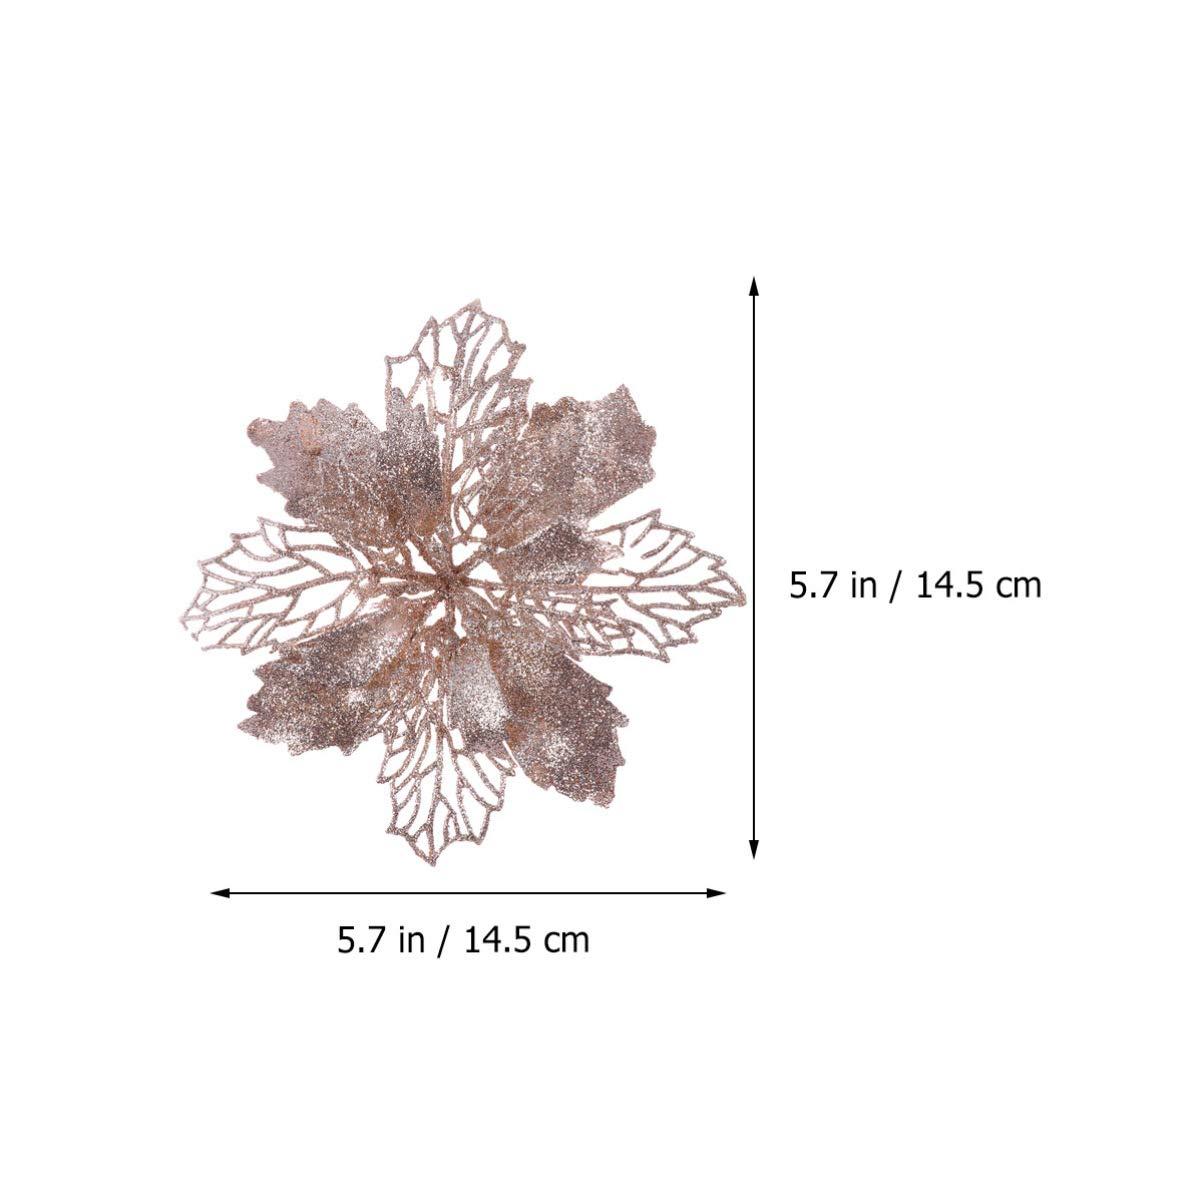 STOBOK 12pcs Christmas Poinsettias Flowers Glitter Poinsettias Christmas Tree Decorations Ornaments DIY Artificial Flowers Champagne